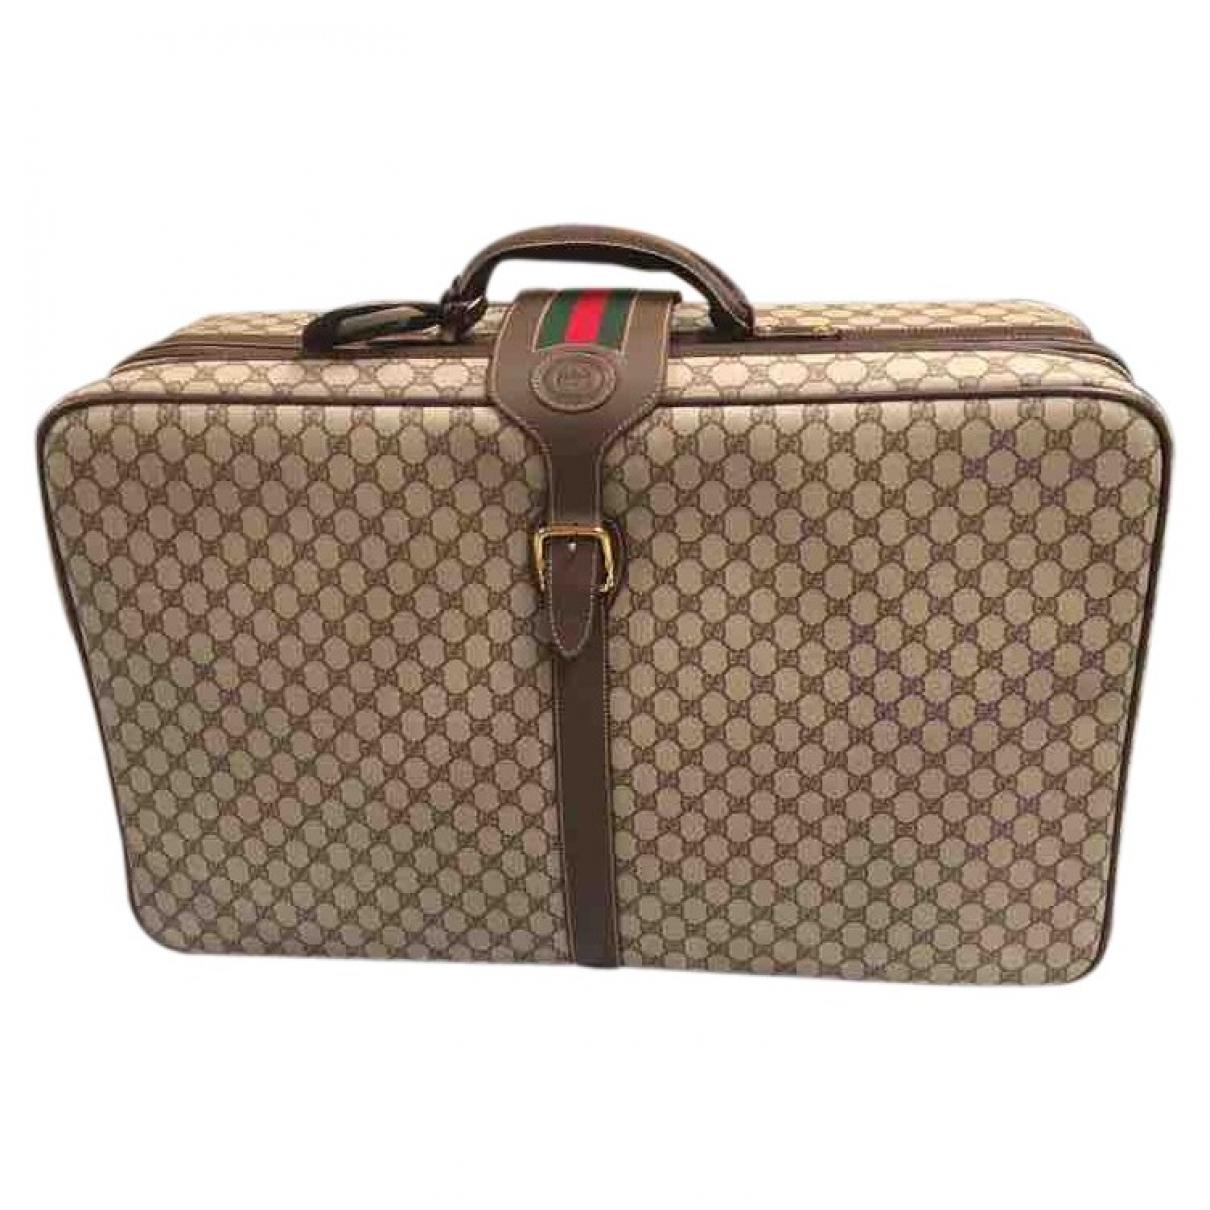 Gucci \N Cloth Travel bag for Women \N